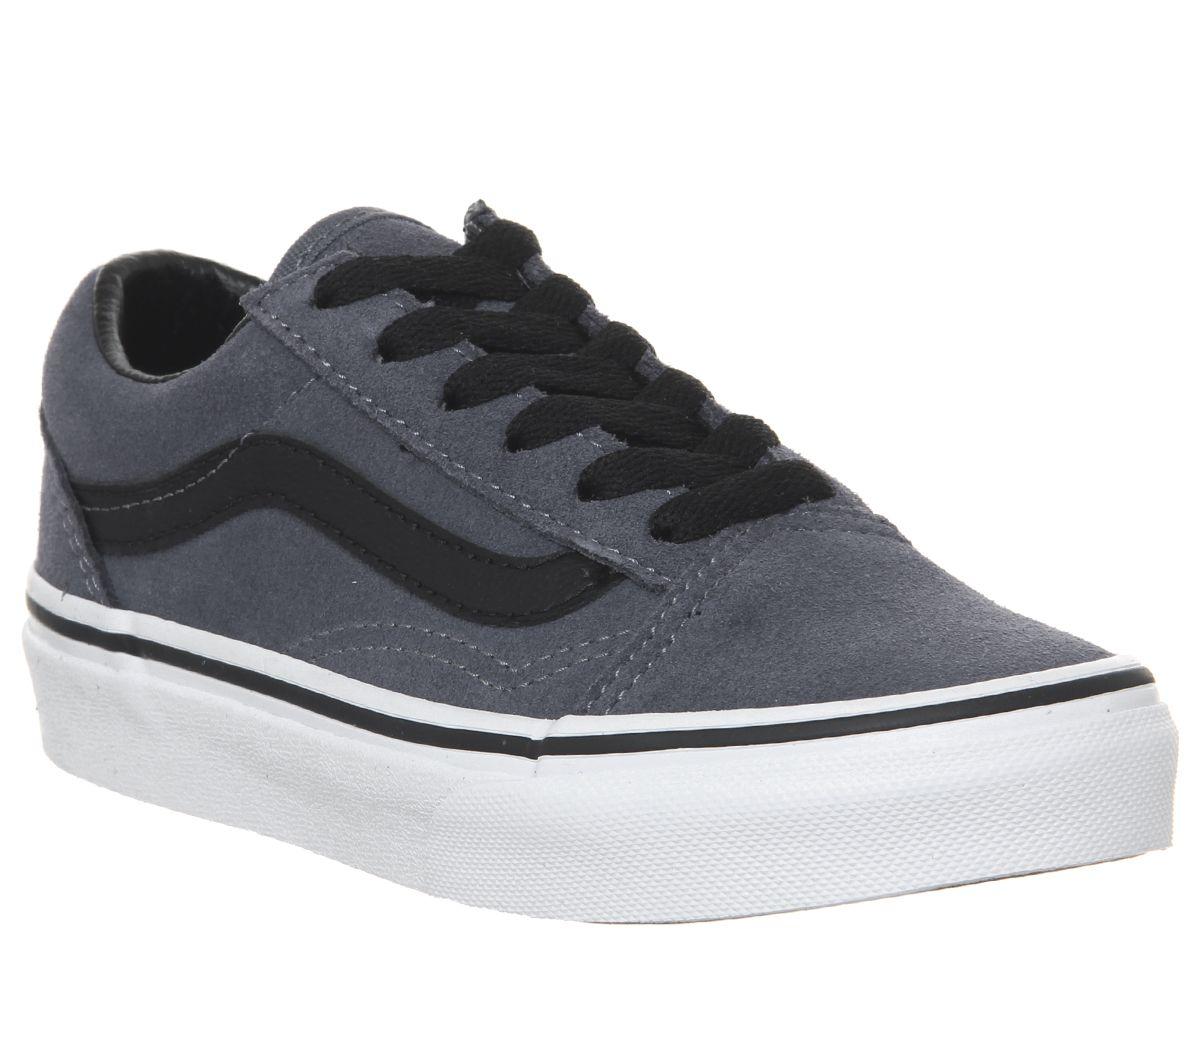 173e180b19c4 Vans Old Skool Lace Kids Trainers Grisaille Blue Black White - Unisex